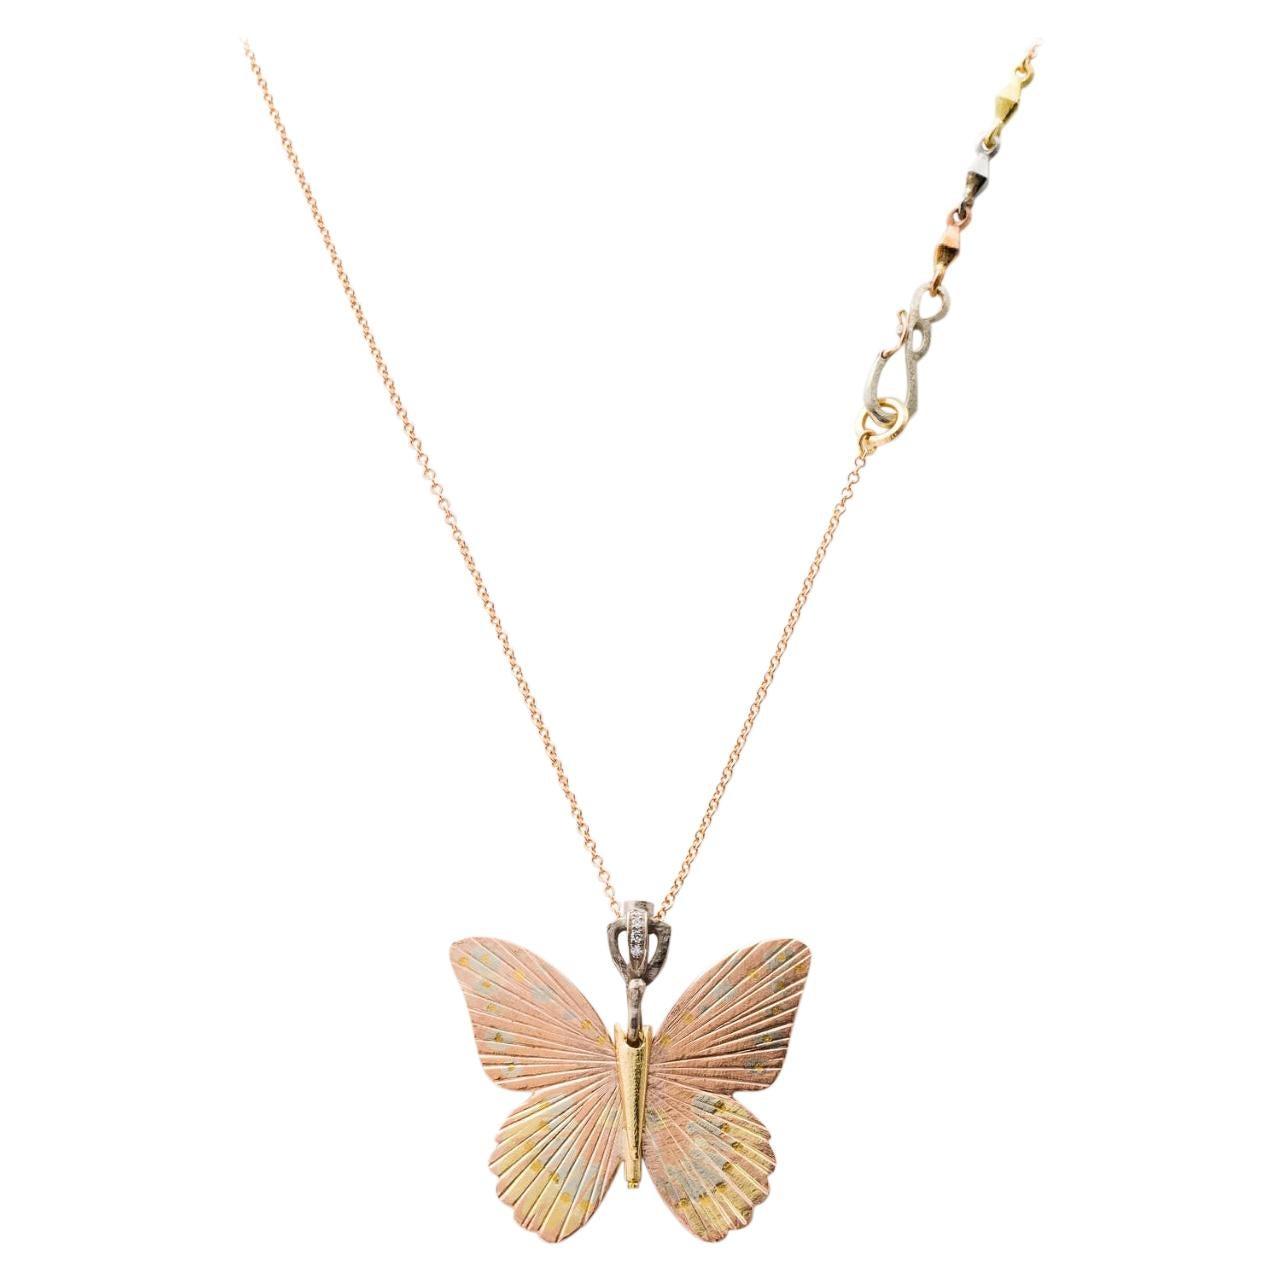 18 Karat Large Goliath Birdwing Butterfly Hinge Necklace